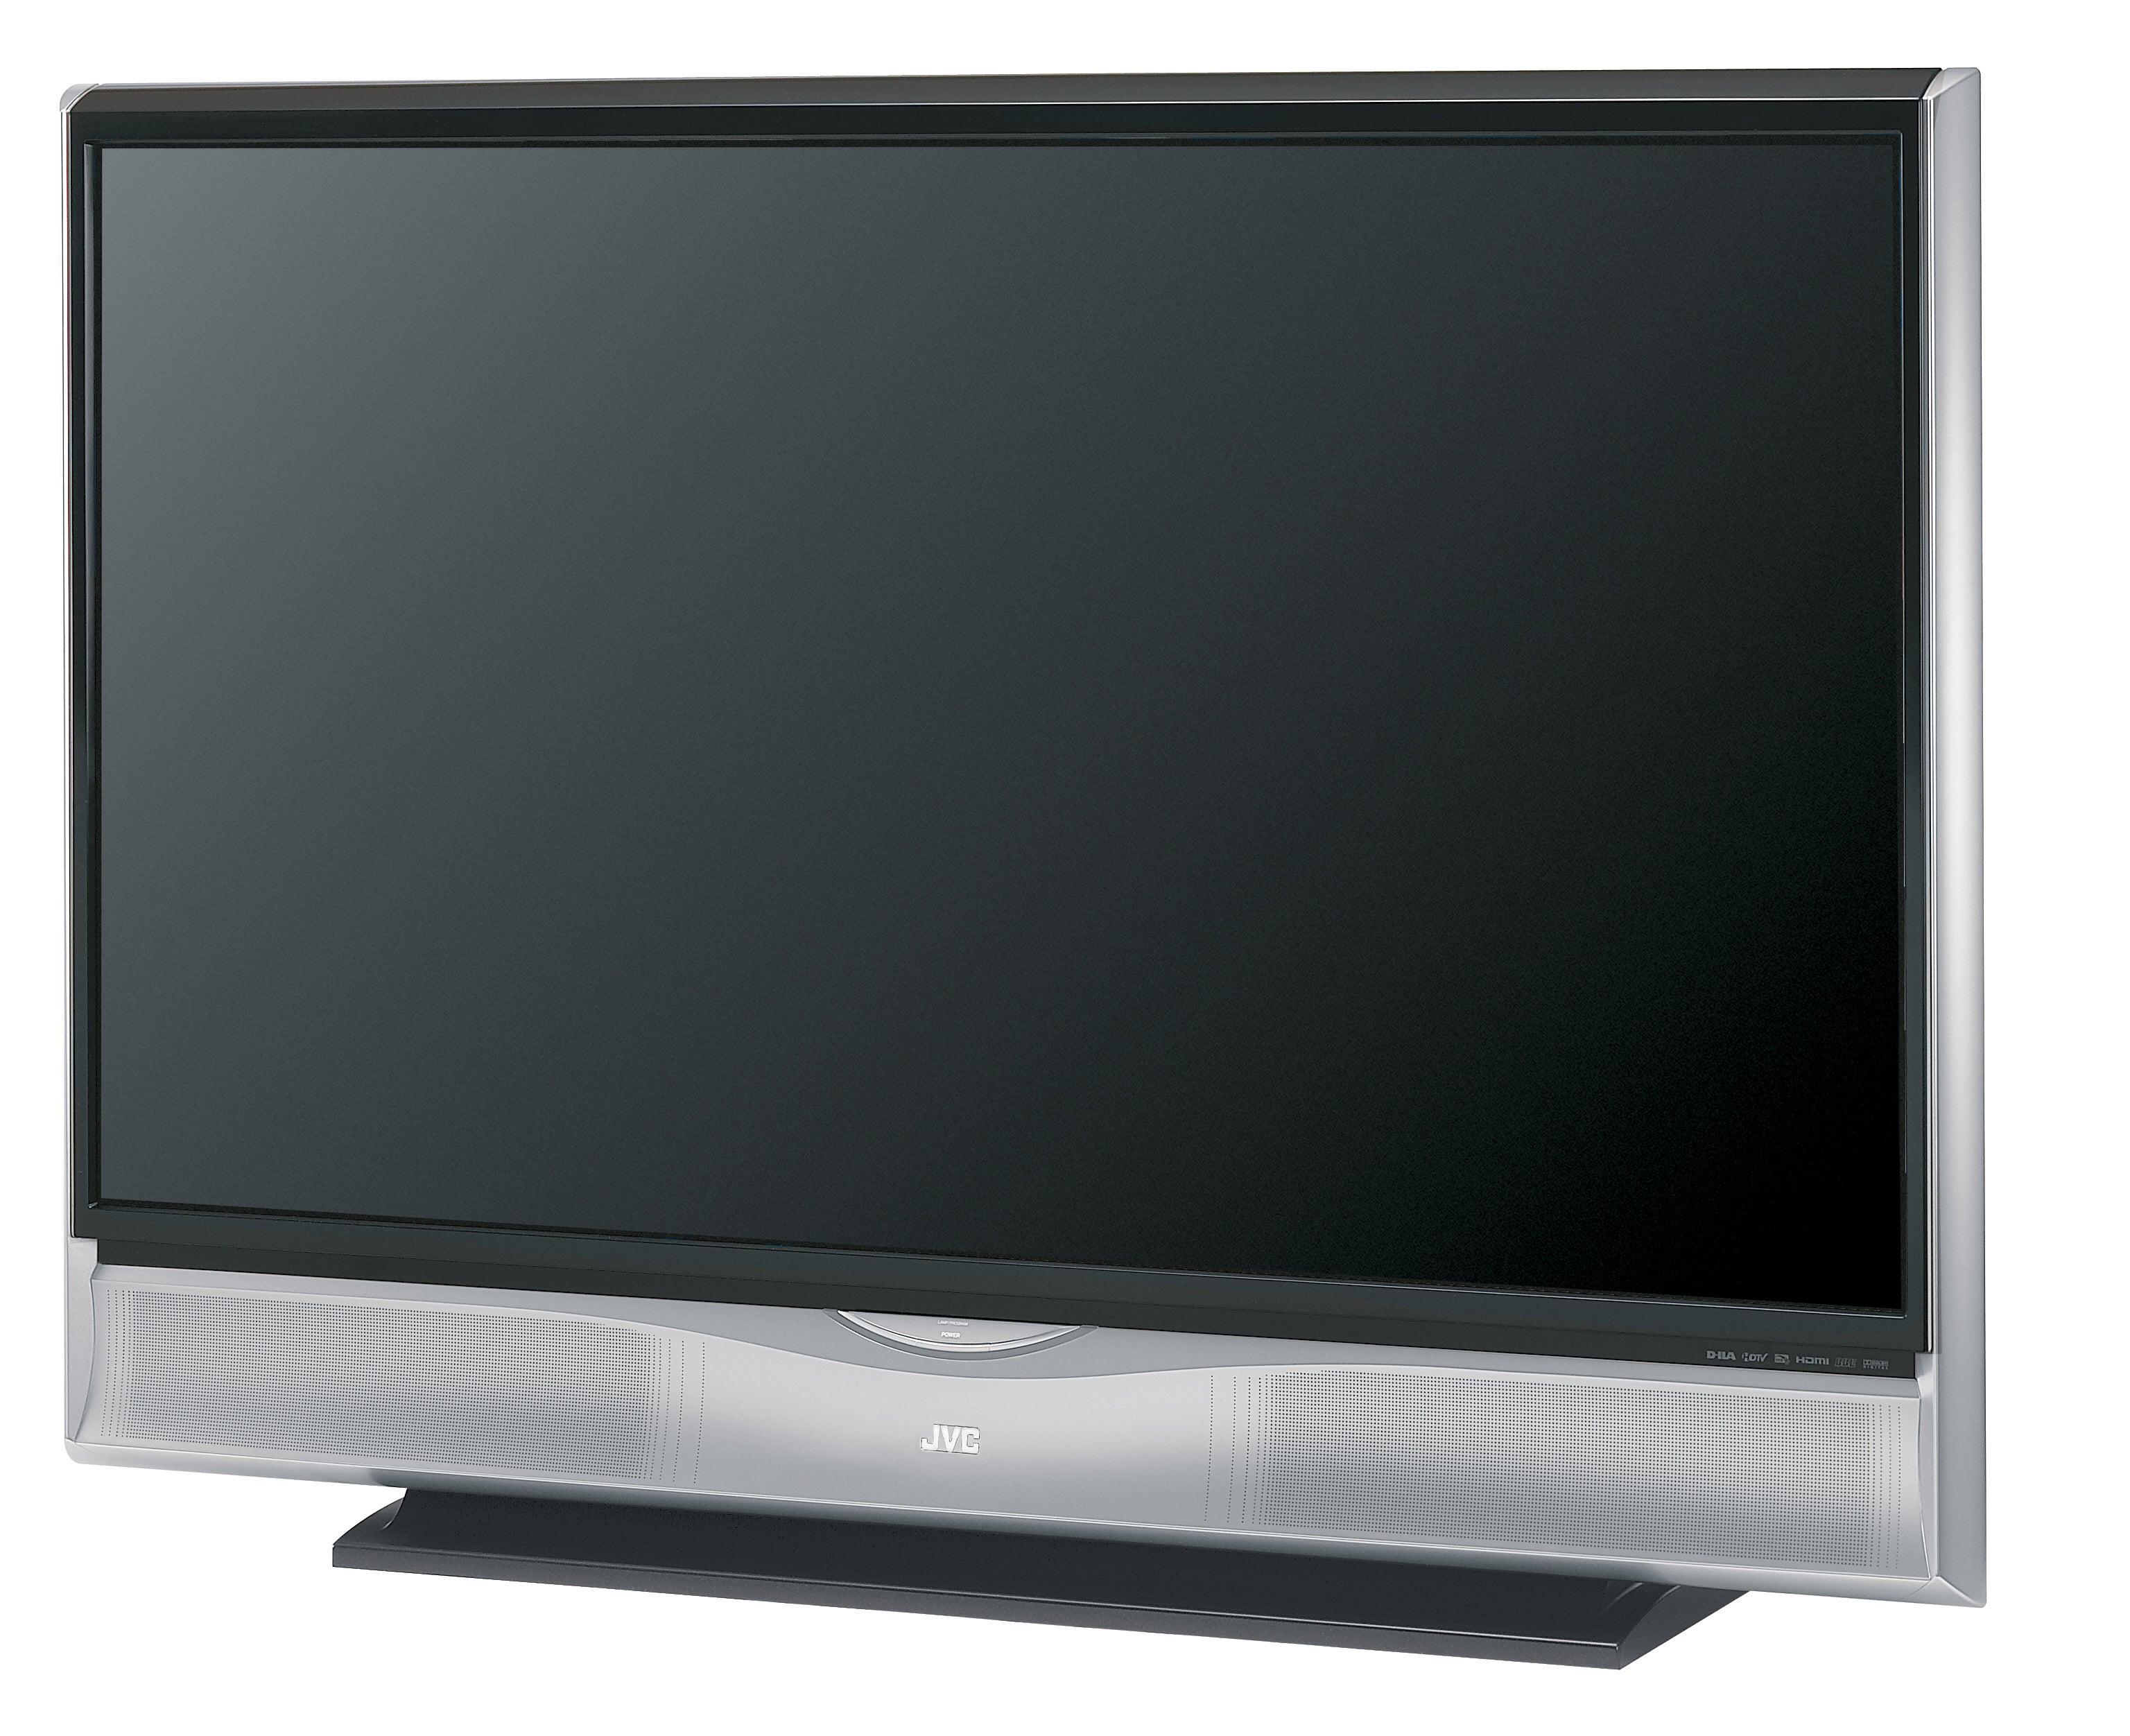 jvc hd 52g786 52 inch hd ila hdtv rear projection tv. Black Bedroom Furniture Sets. Home Design Ideas